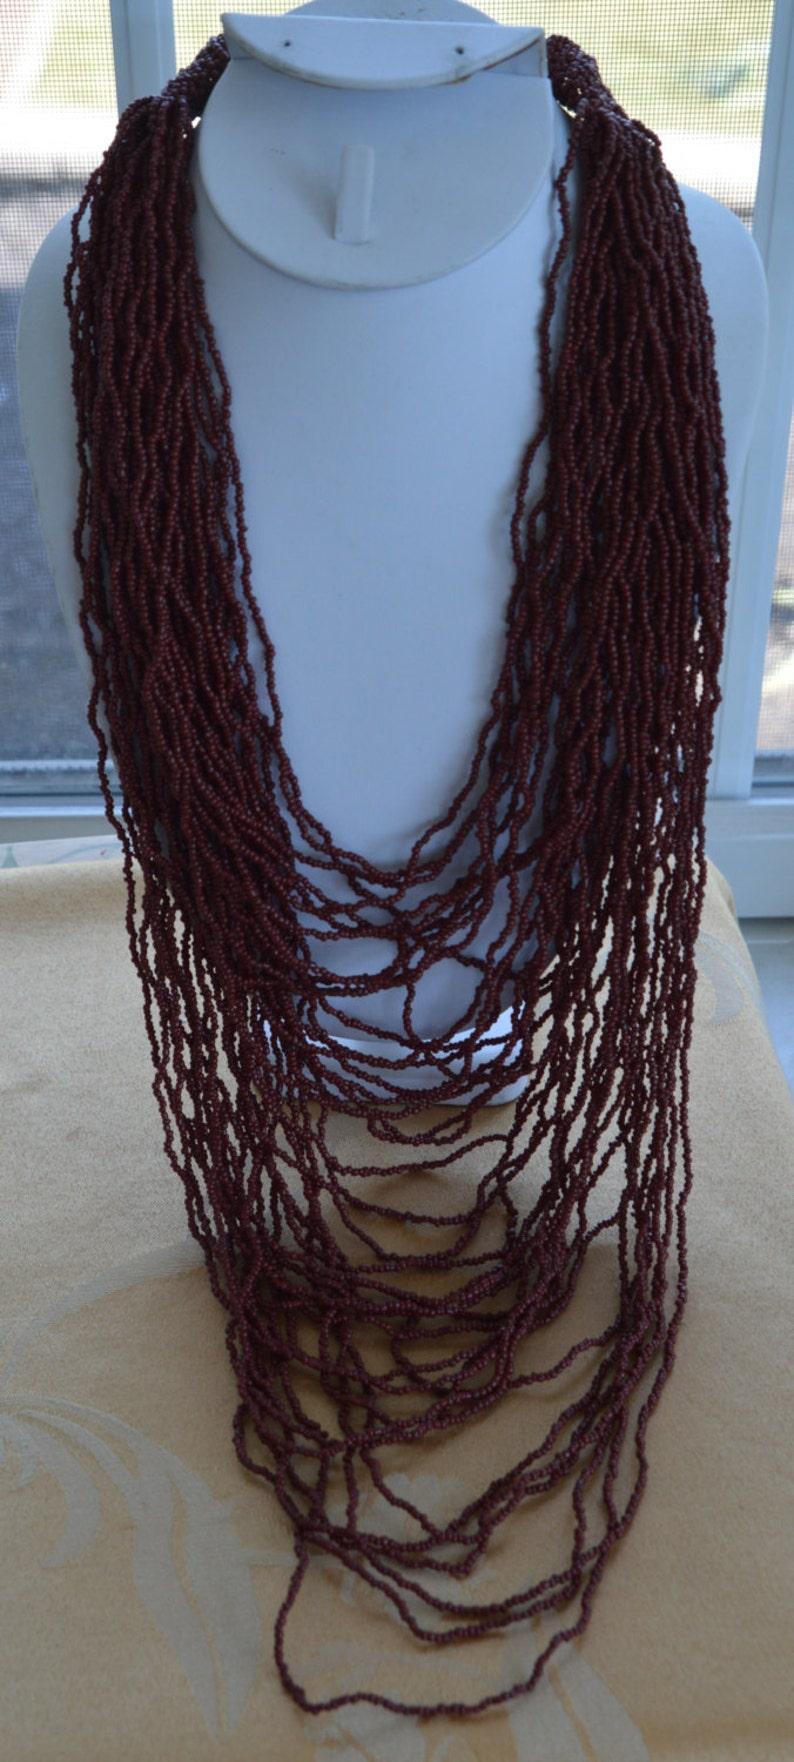 Pretty Vintage Reddish Brown Glass Seed Bead Multi-Strand Tribal Necklace 20-40